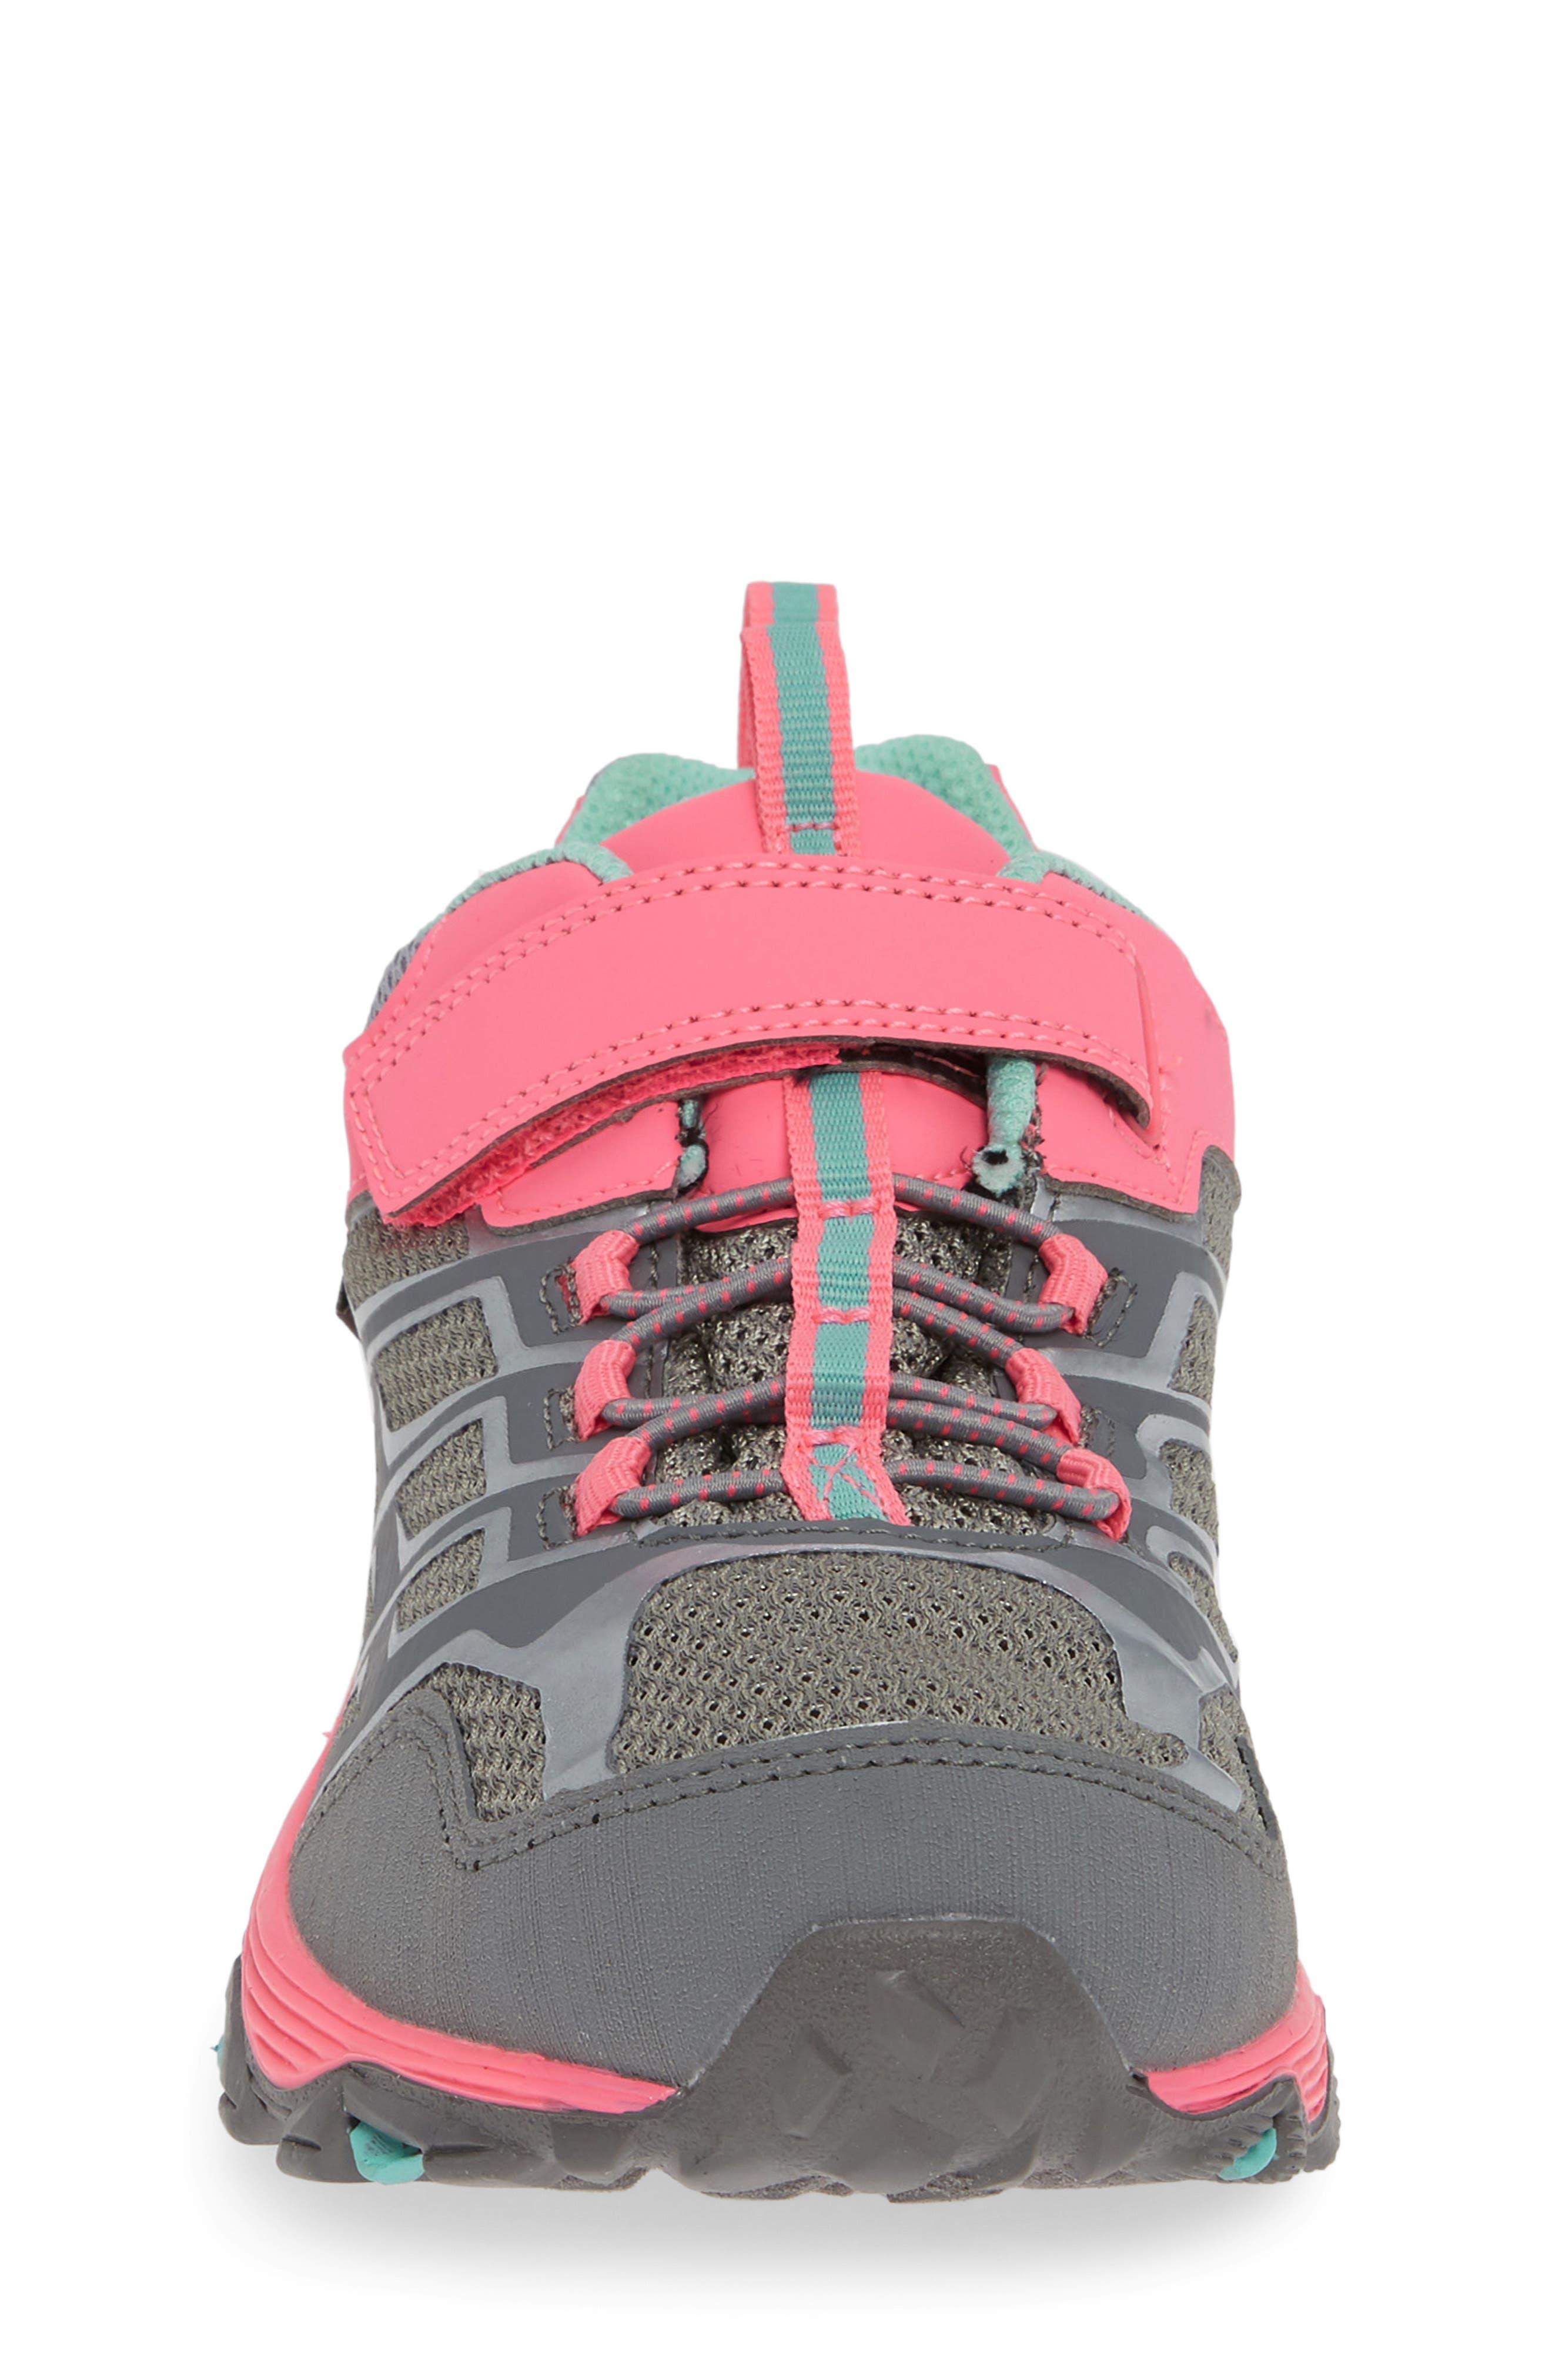 MERRELL, Moab FST Polar Low Waterproof Sneaker, Alternate thumbnail 4, color, GREY/ CORAL